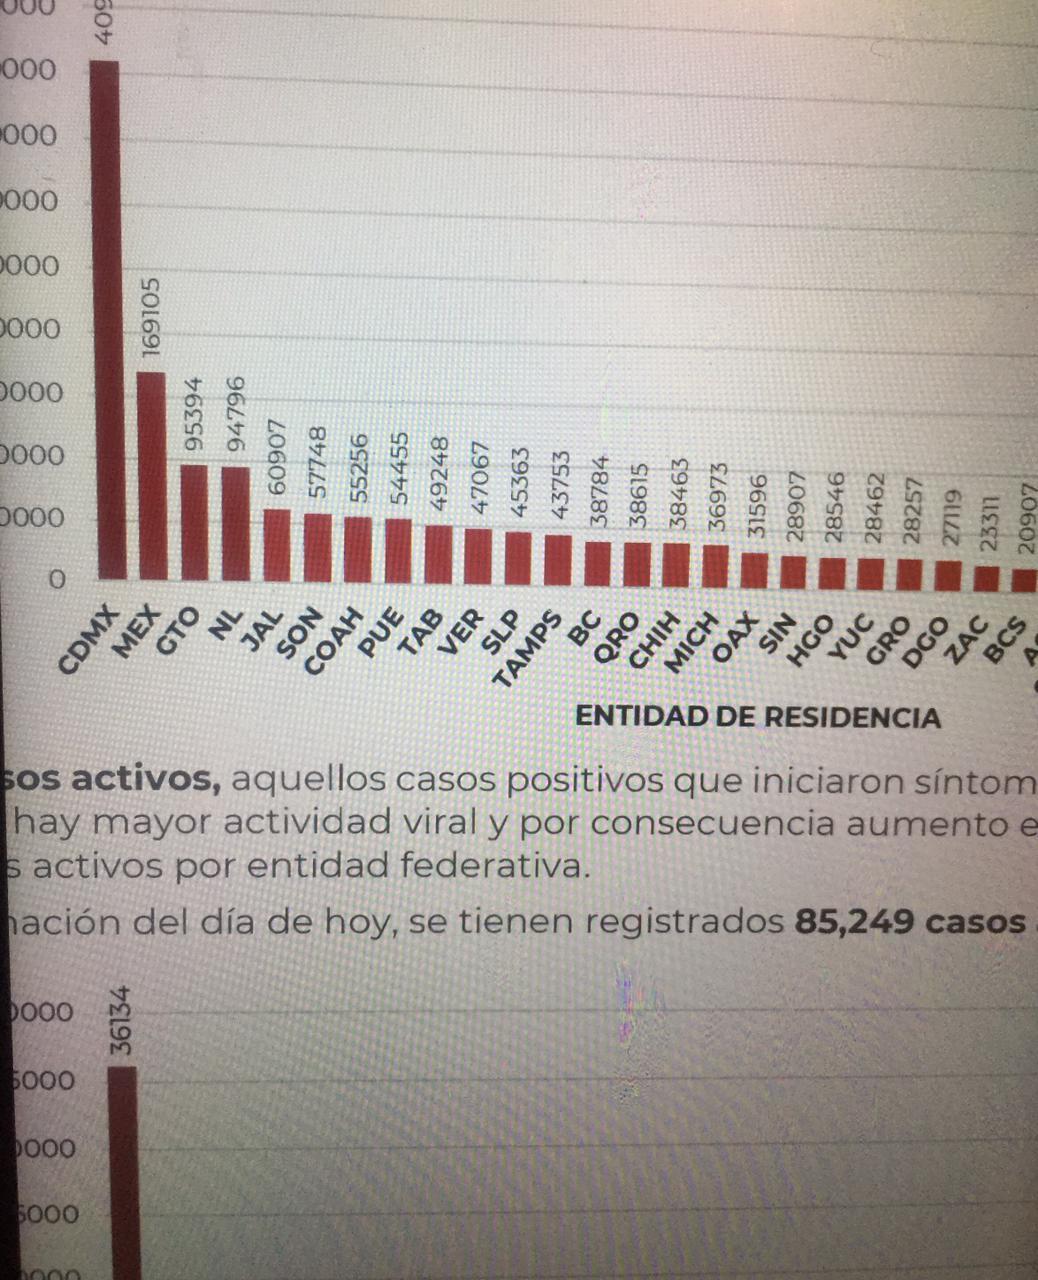 México inicia la semana con 141 mil 248 fallecidos por Coronavirus